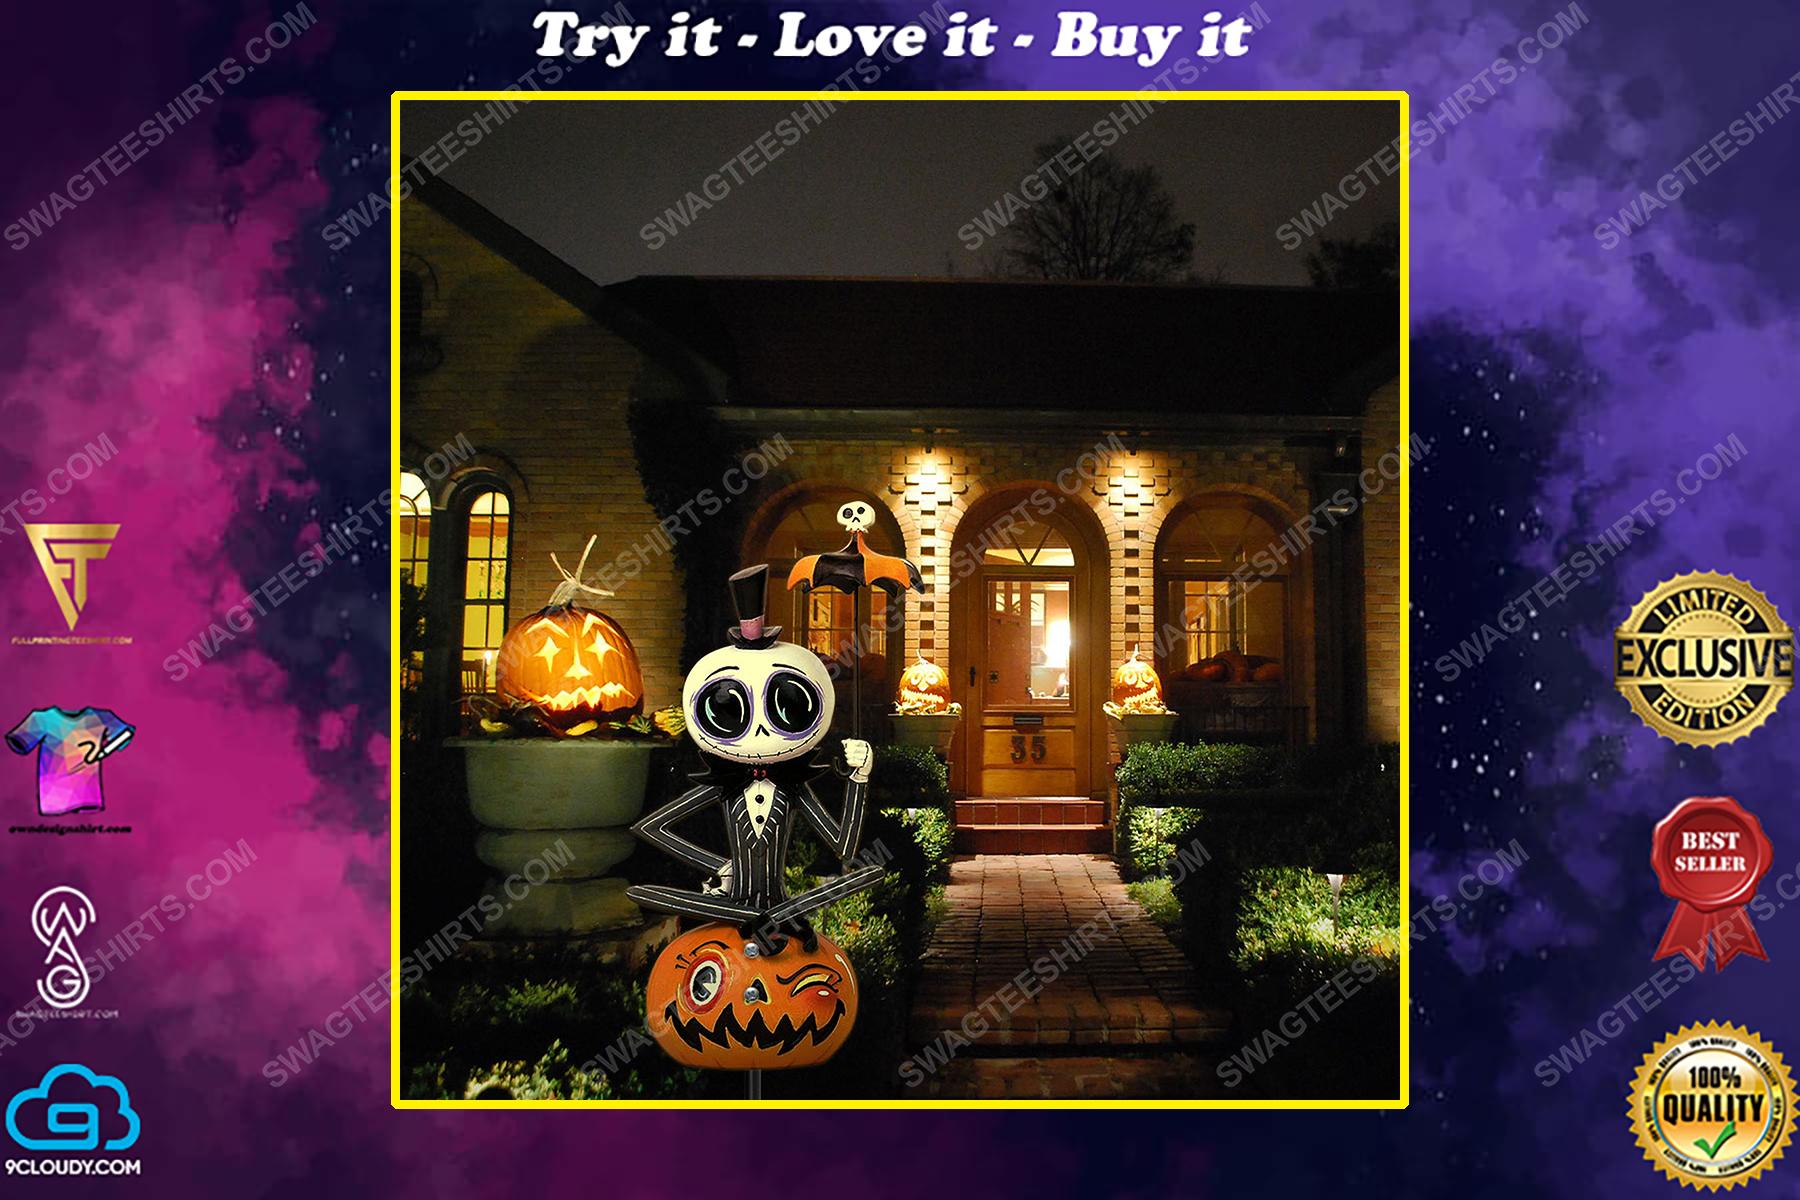 Jack skellington and pumpkin halloween yard sign